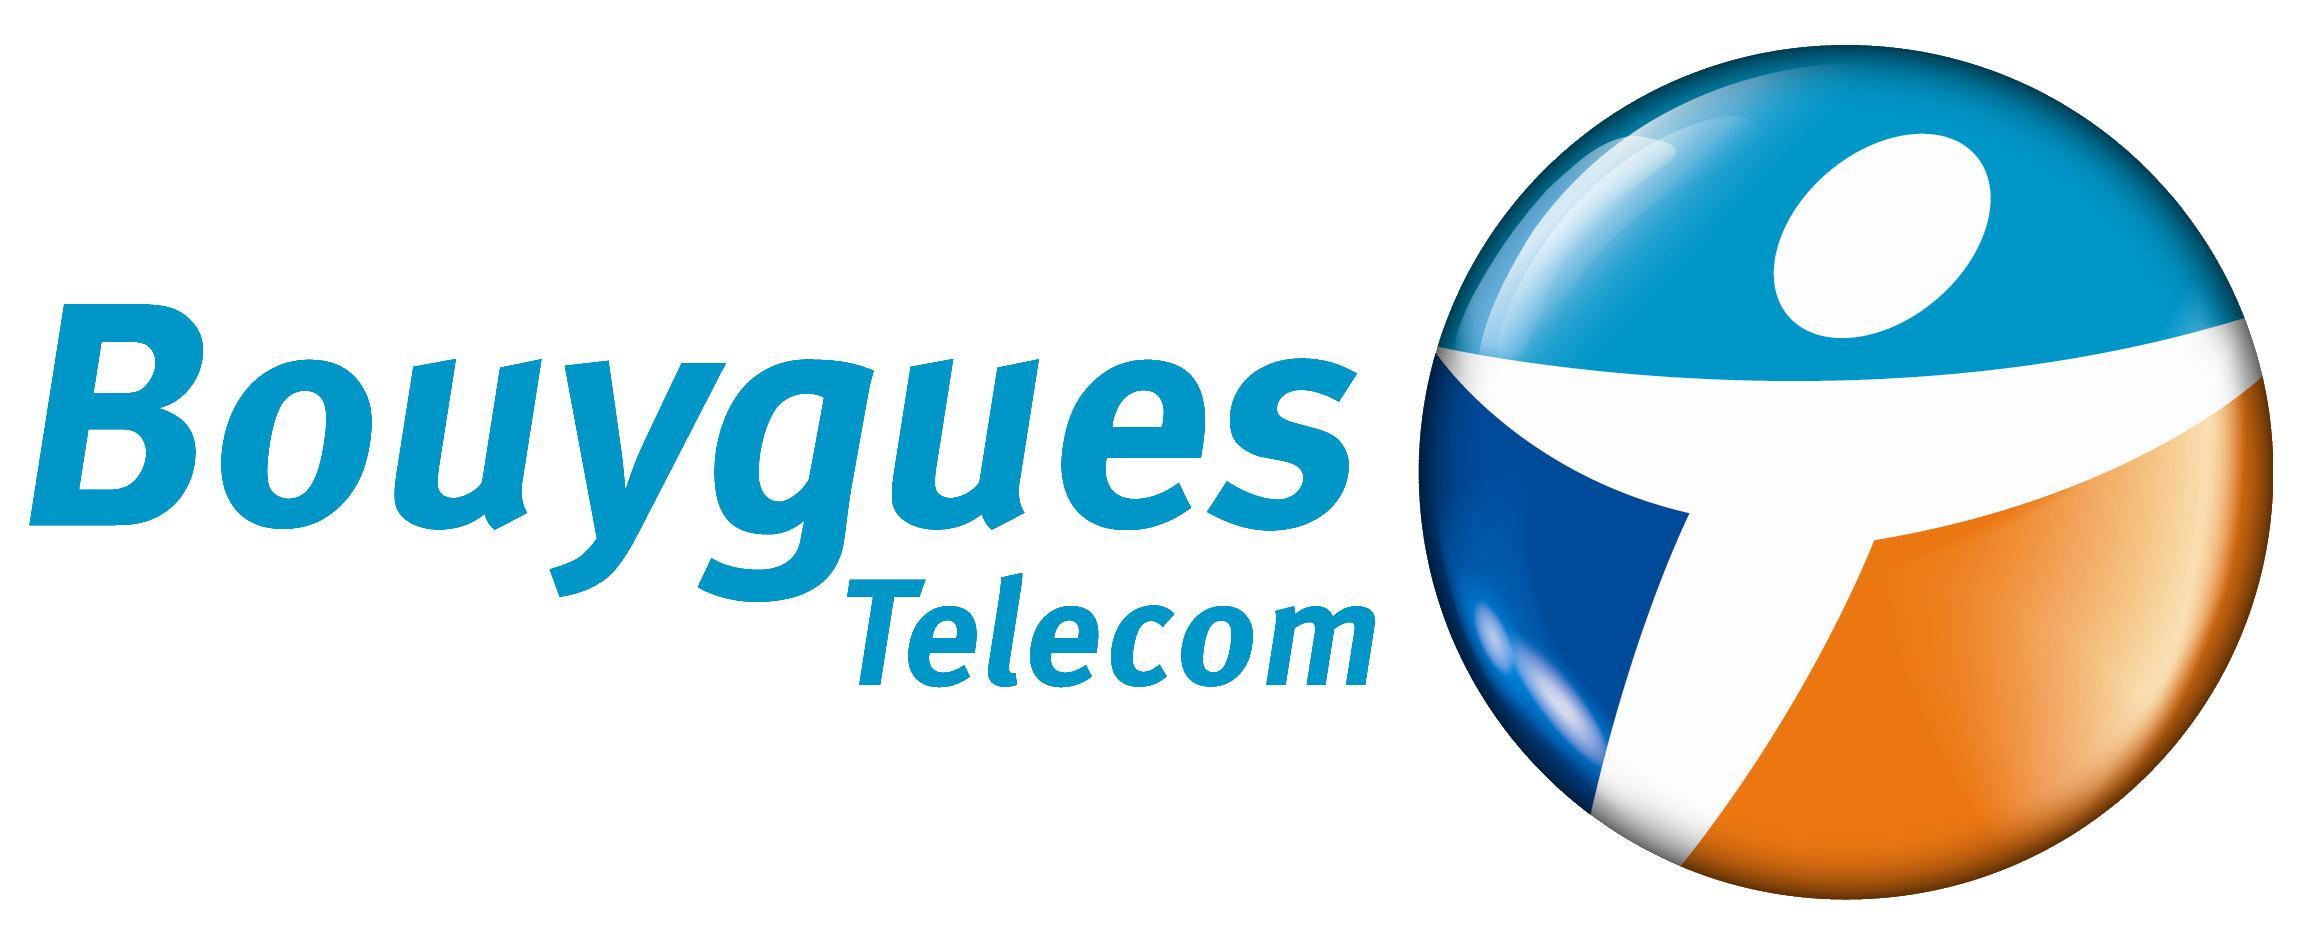 ancien logo bouygues telecom - Bouygues Telecom Logo PNG